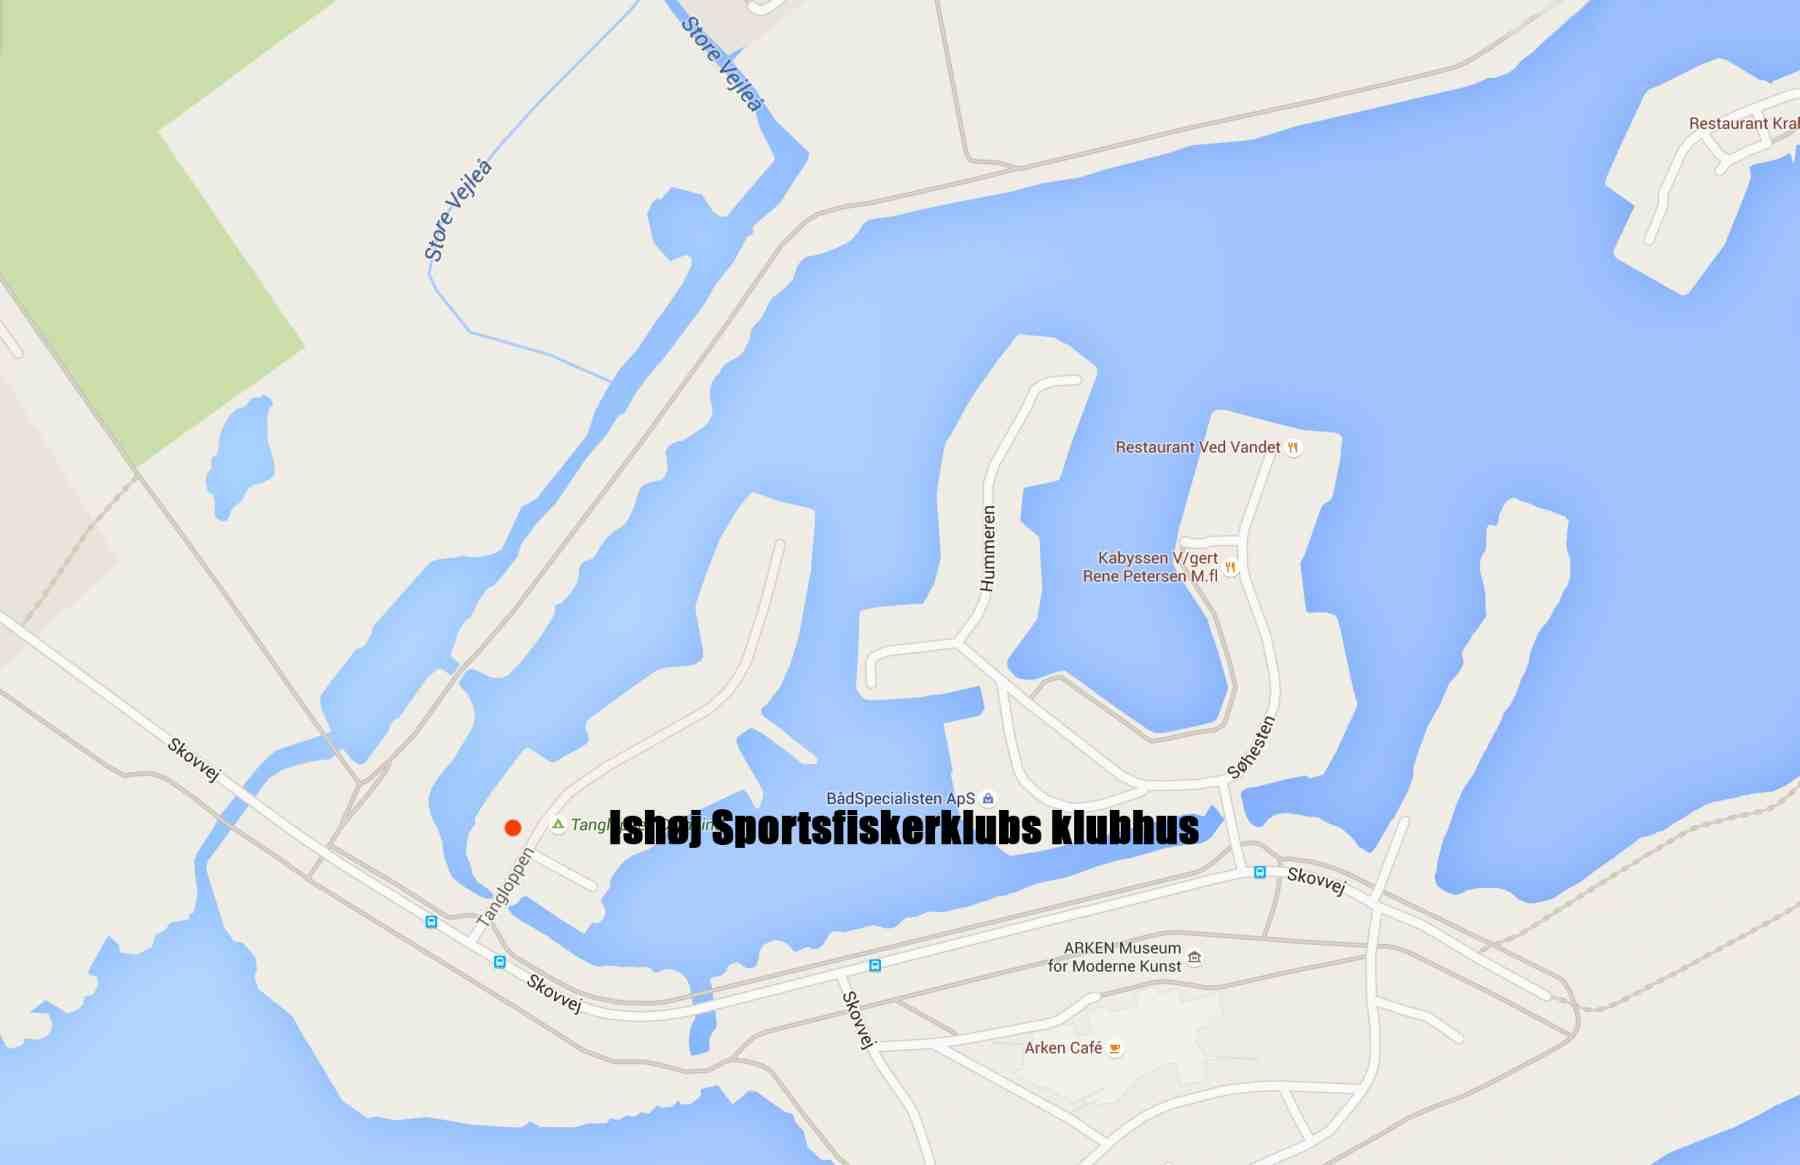 Ishøj Klubhus